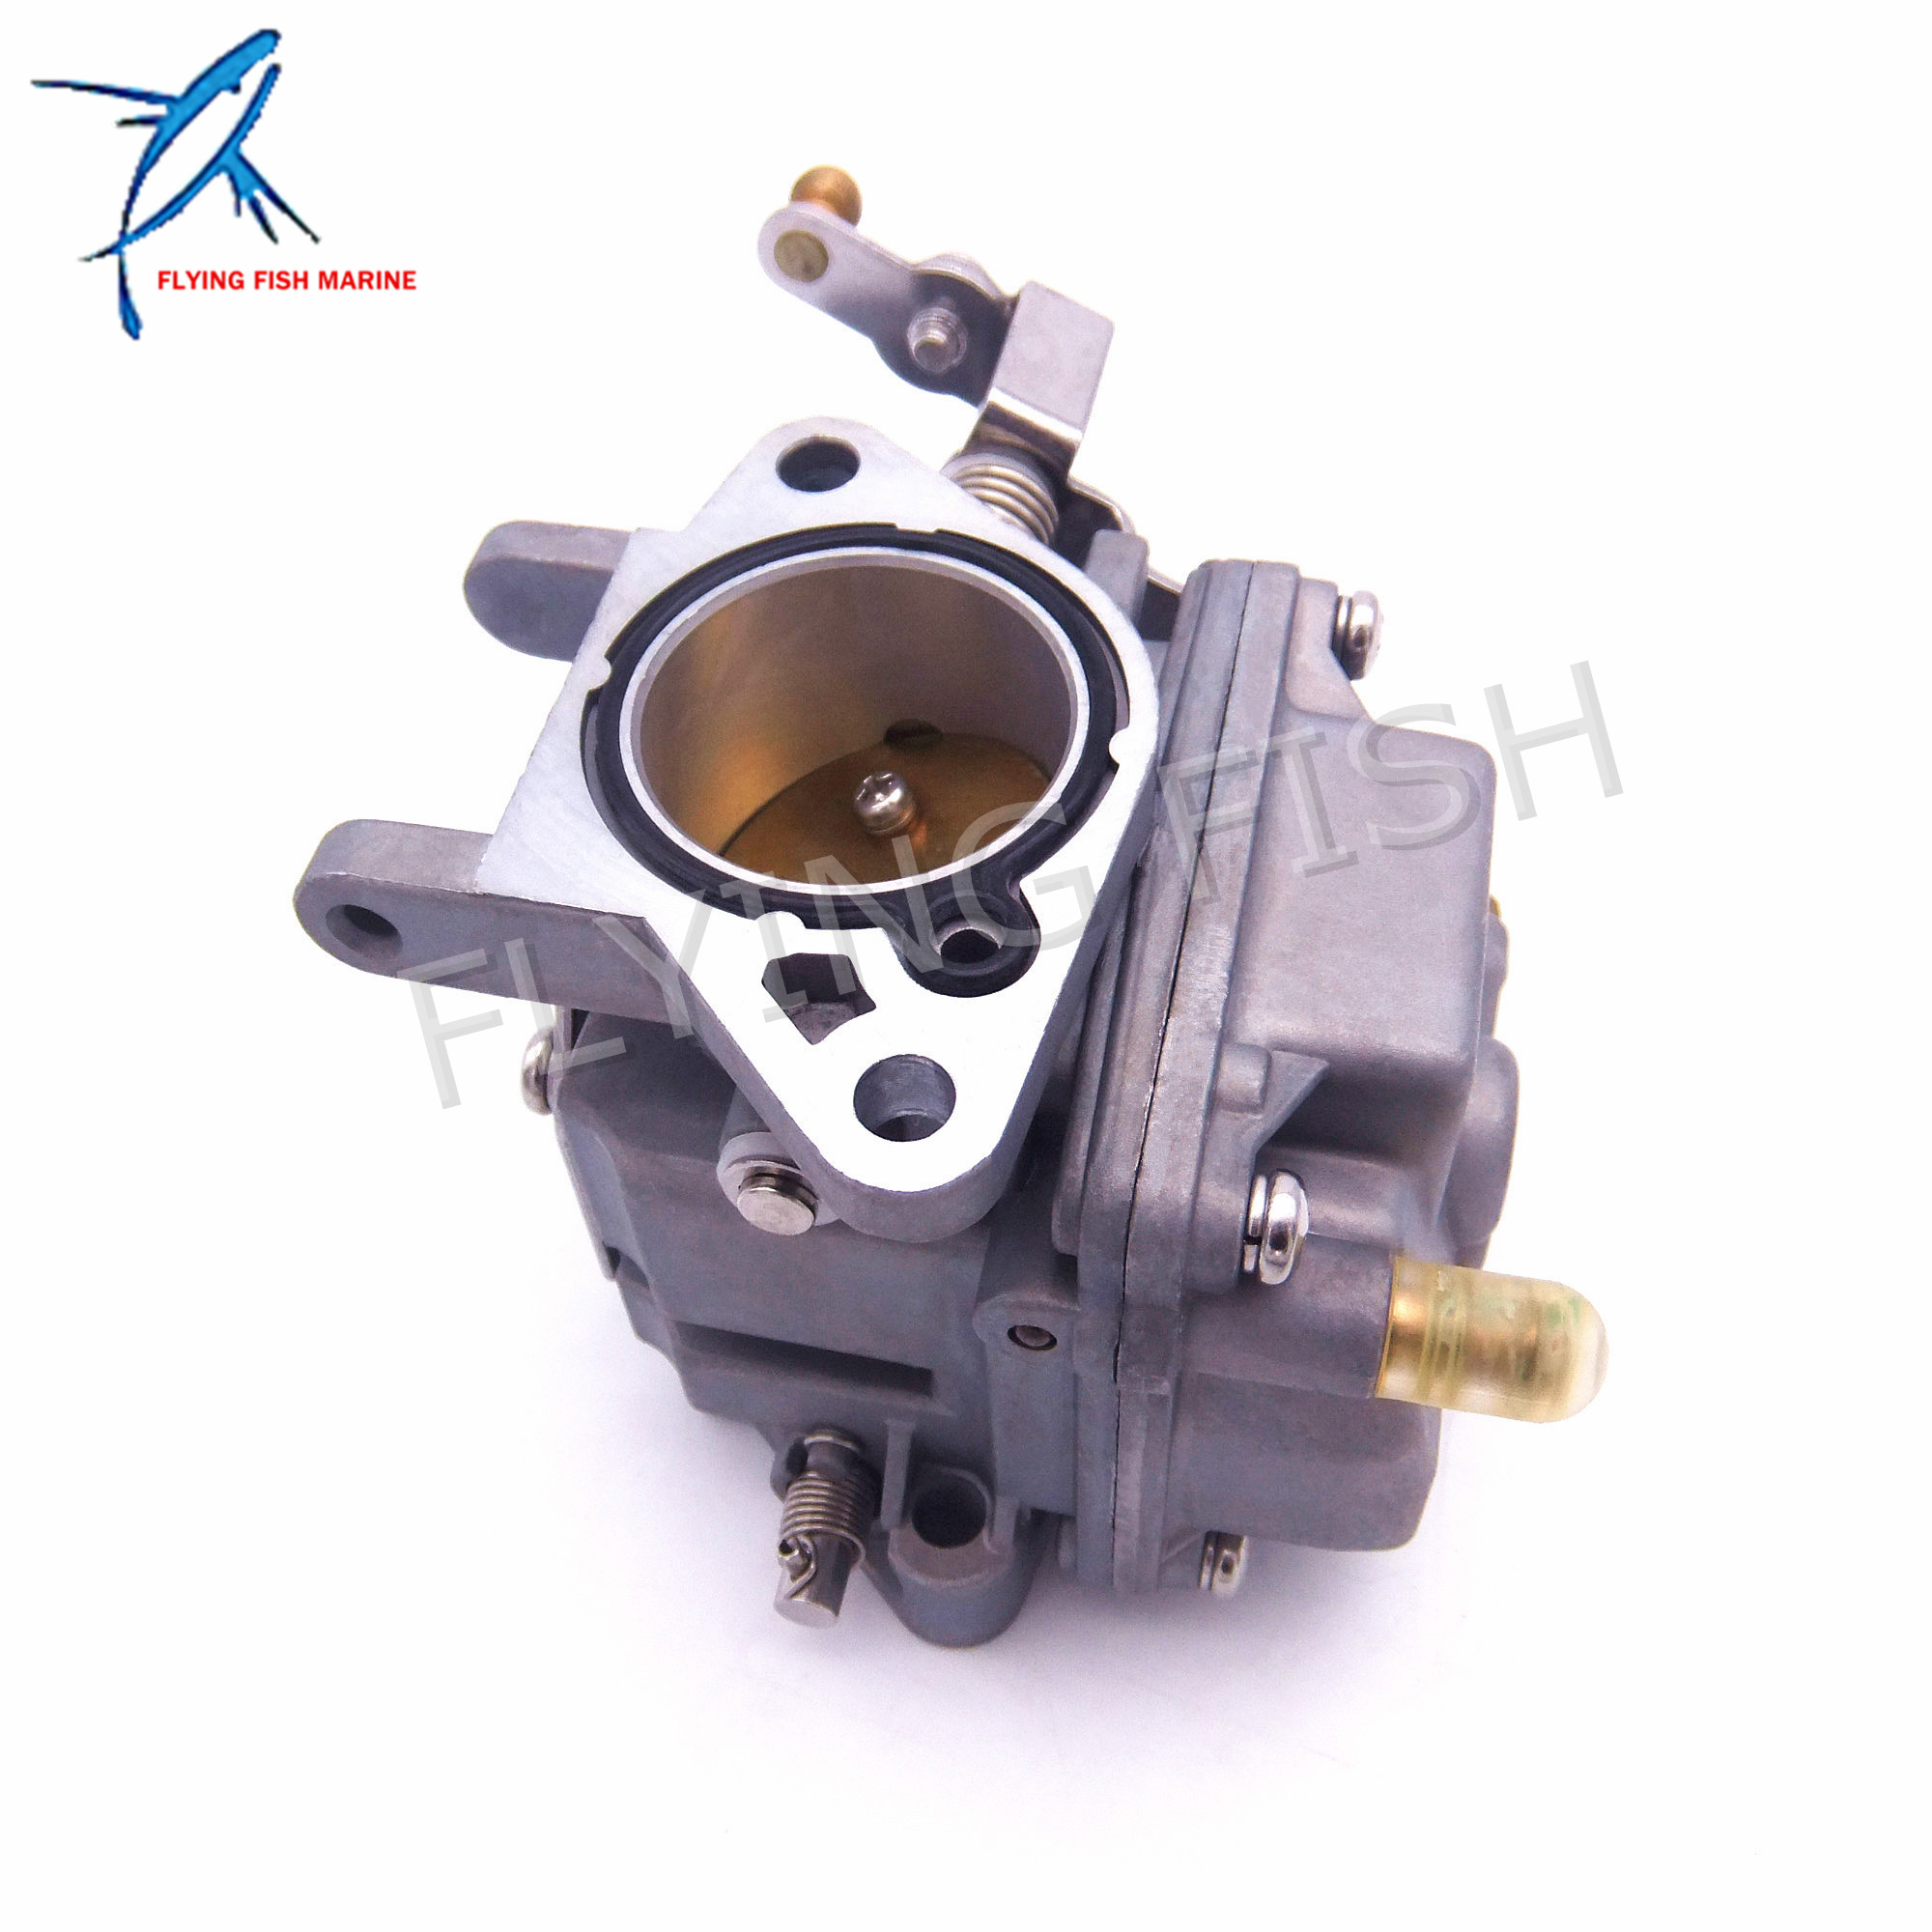 купить Boat Motor Carburetor Assy 30F-01.03.03.00 for Hidea 2-stroke 25F 30F Outboard Engine по цене 4258.69 рублей